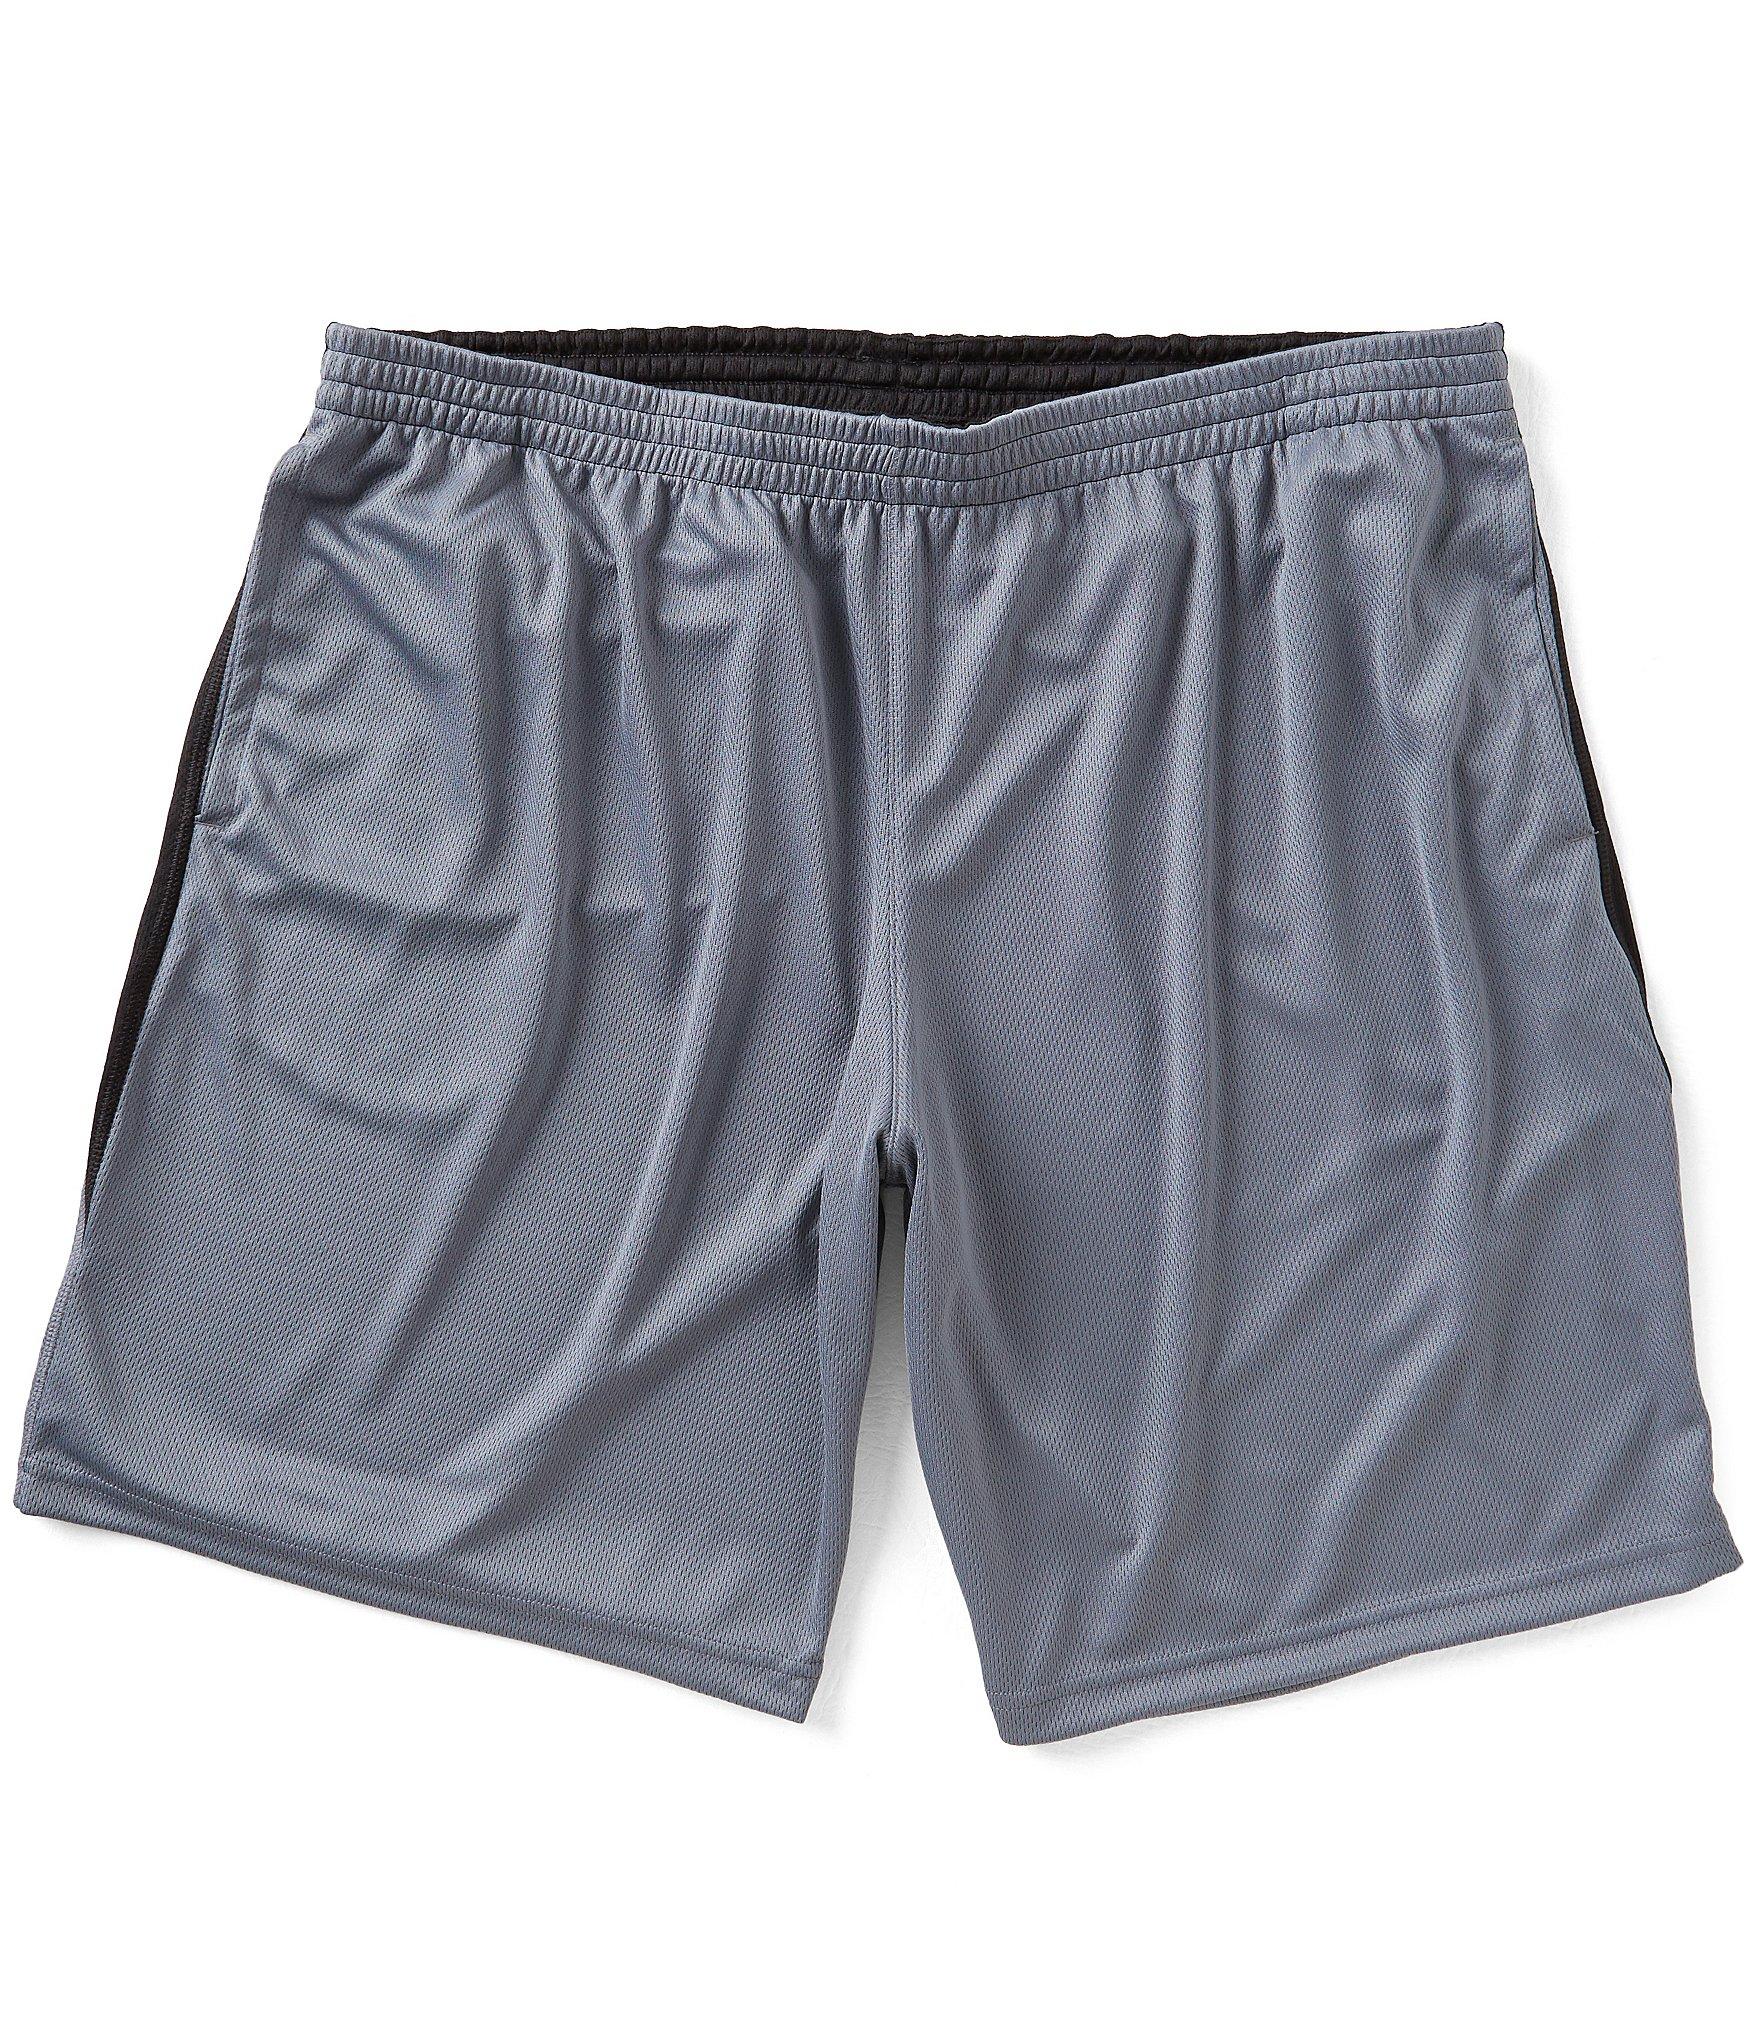 Roundtree & Yorke Sport Big & Tall Mesh Shorts | Dillards